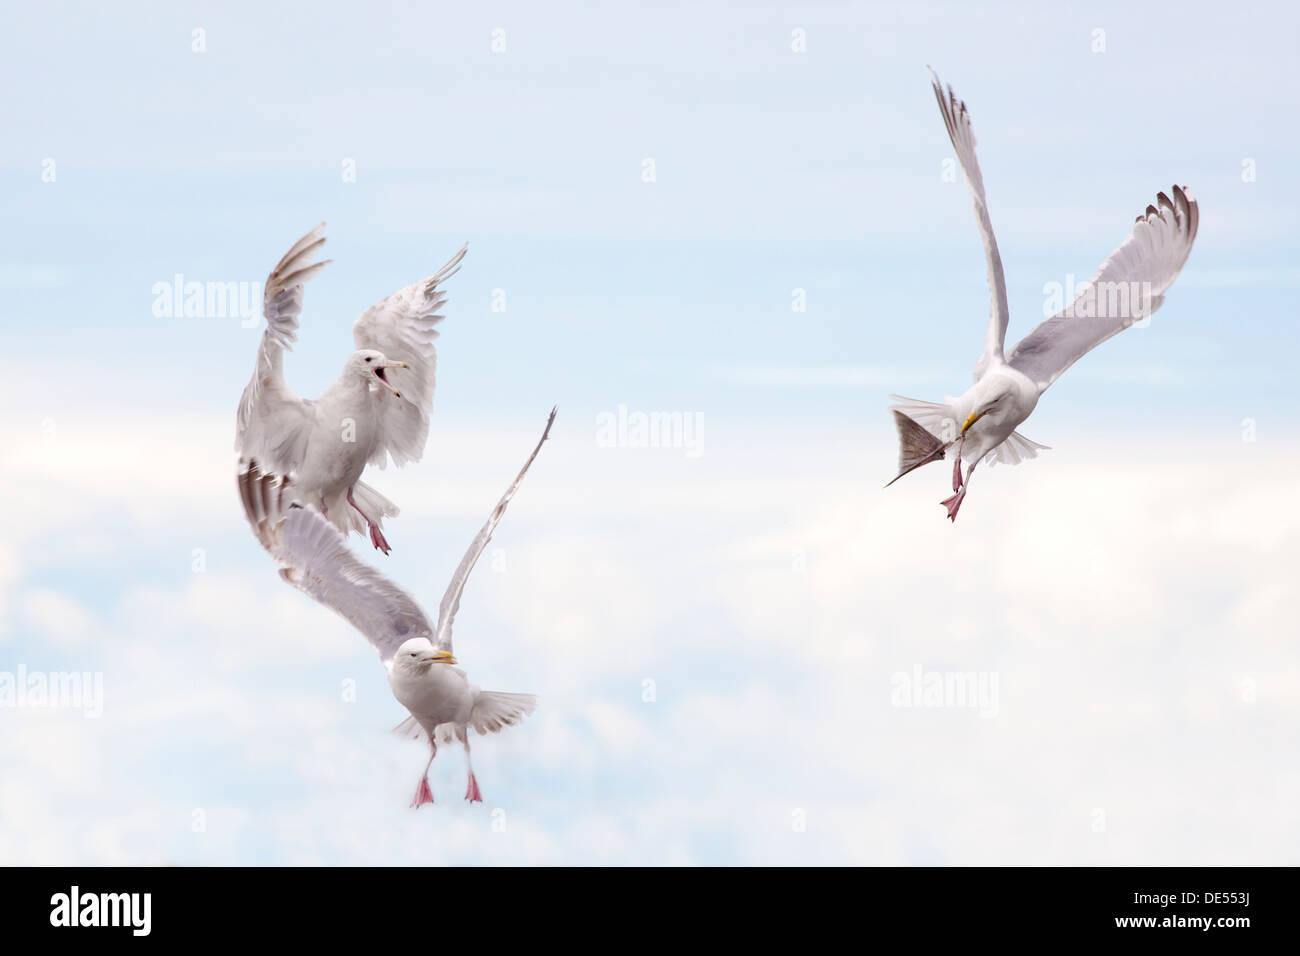 Glaucous-winged Gulls - Larus glaucescens -fighthing for food, Kenai Peninsula, Alaska, U.S.A. - Stock Image